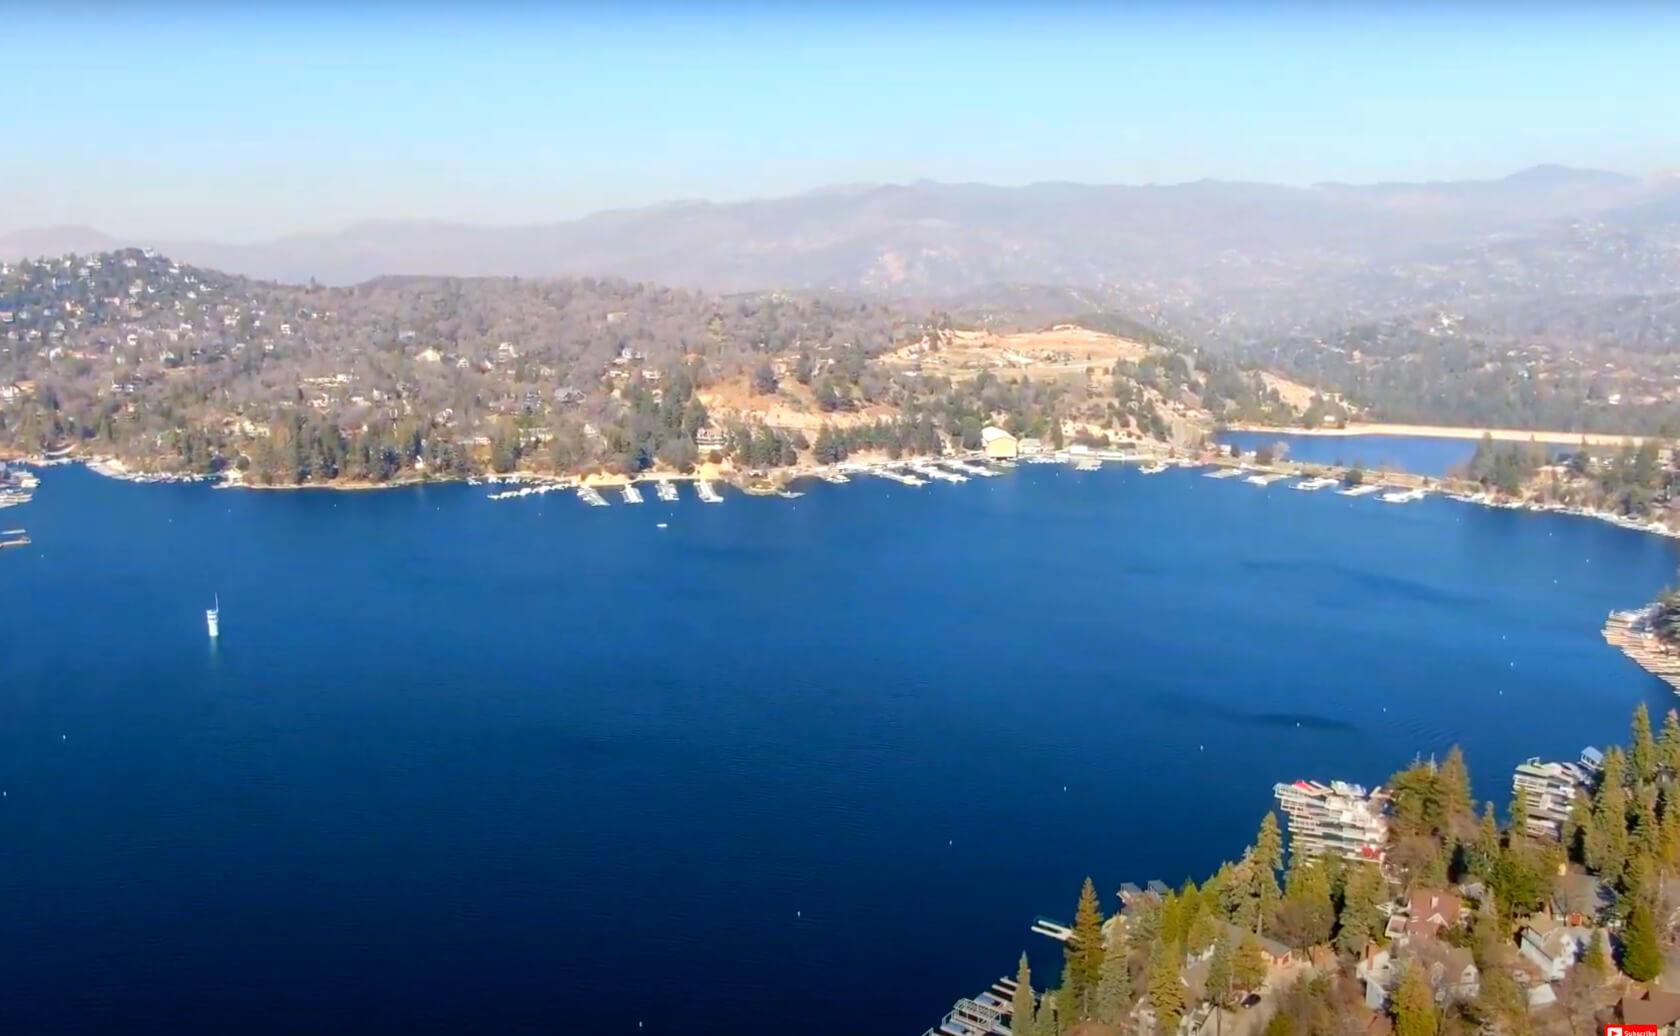 Lake-Arrowhead-CA-Fishing-Guide-01